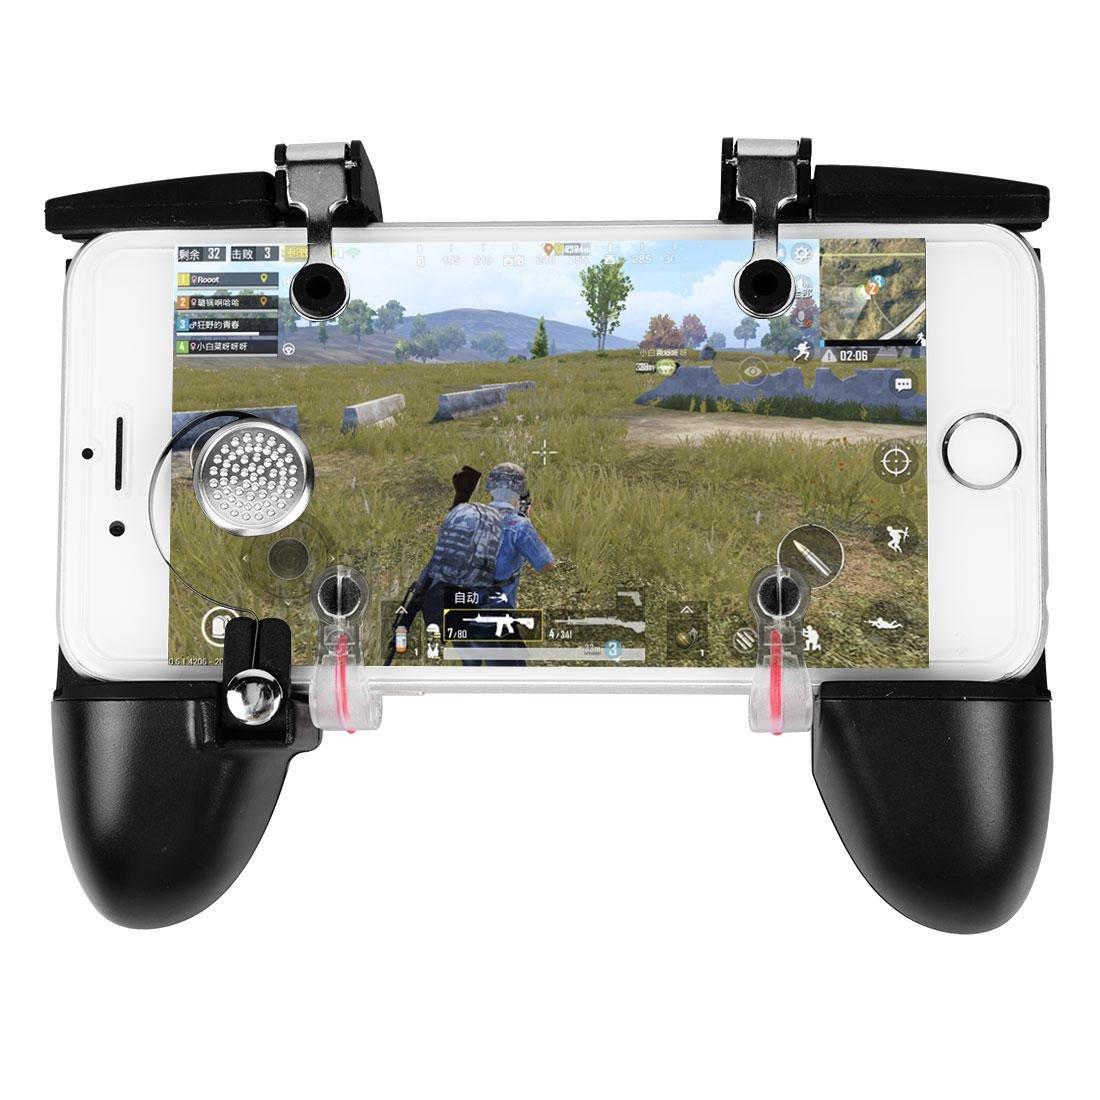 New MVPro Phone Game Trigger Handle Grip